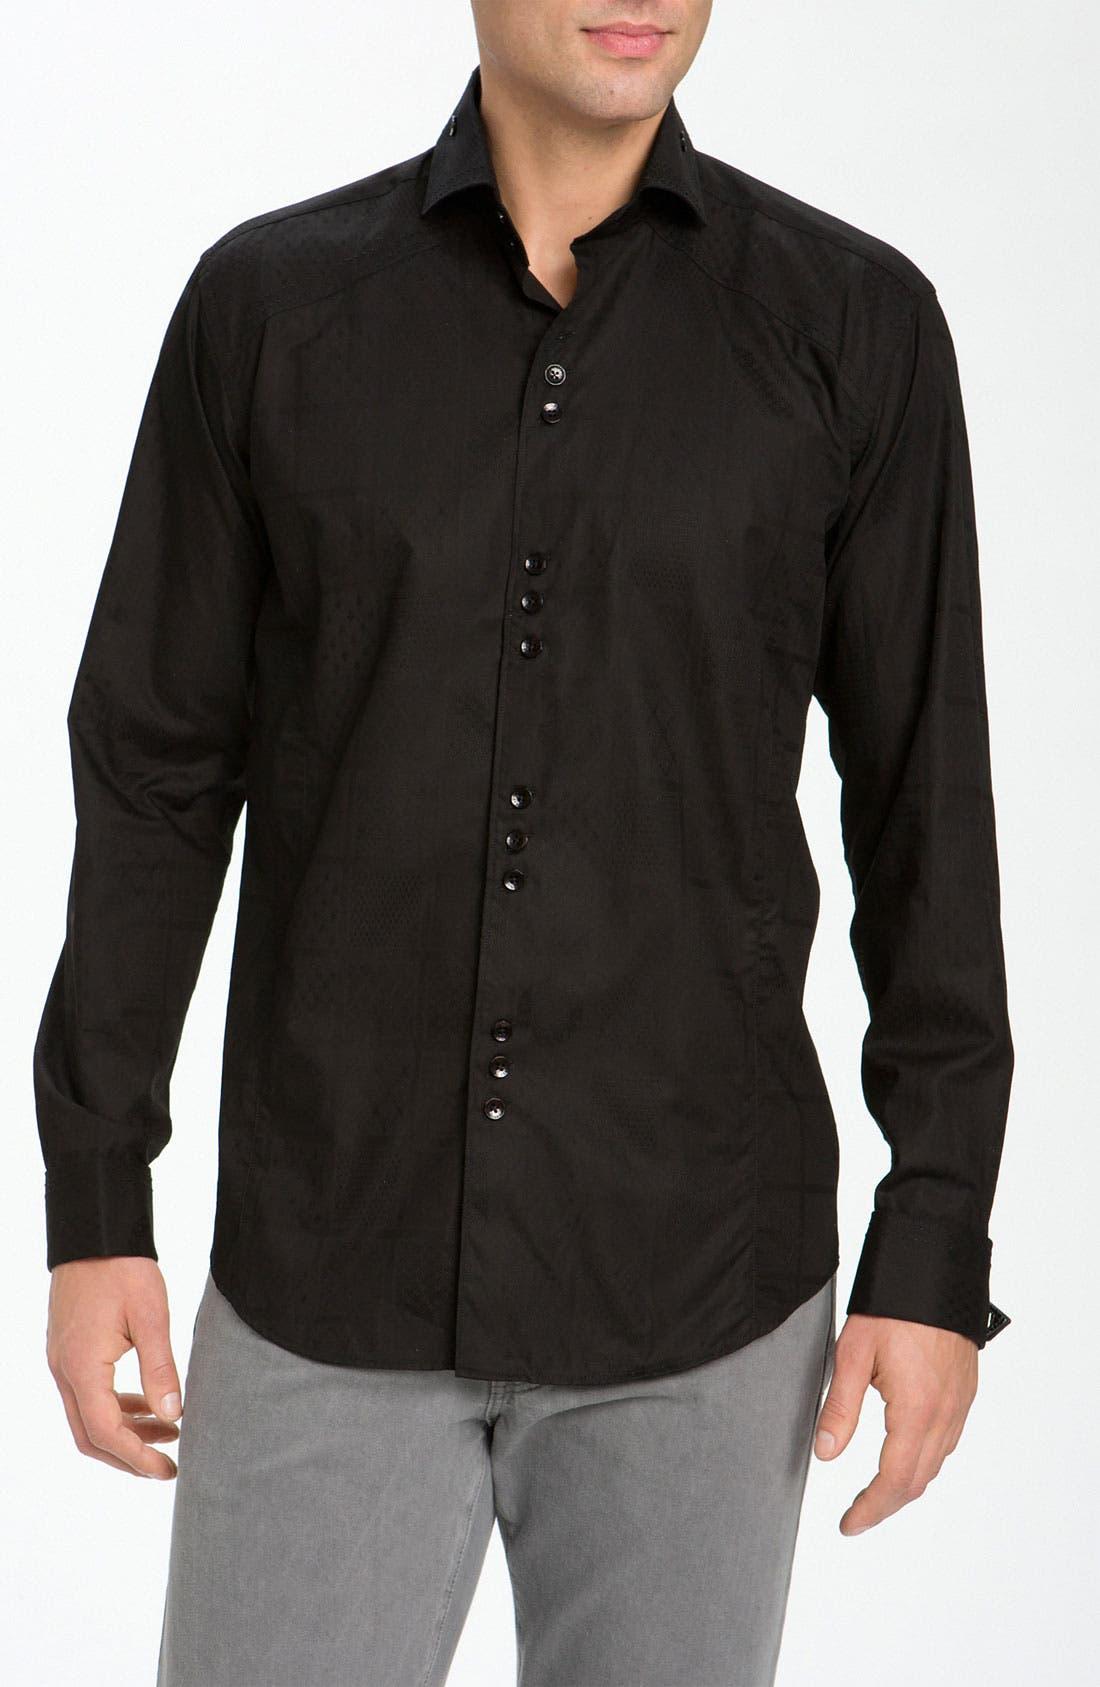 Main Image - Bogosse 'Matis' Jacquard Sport Shirt